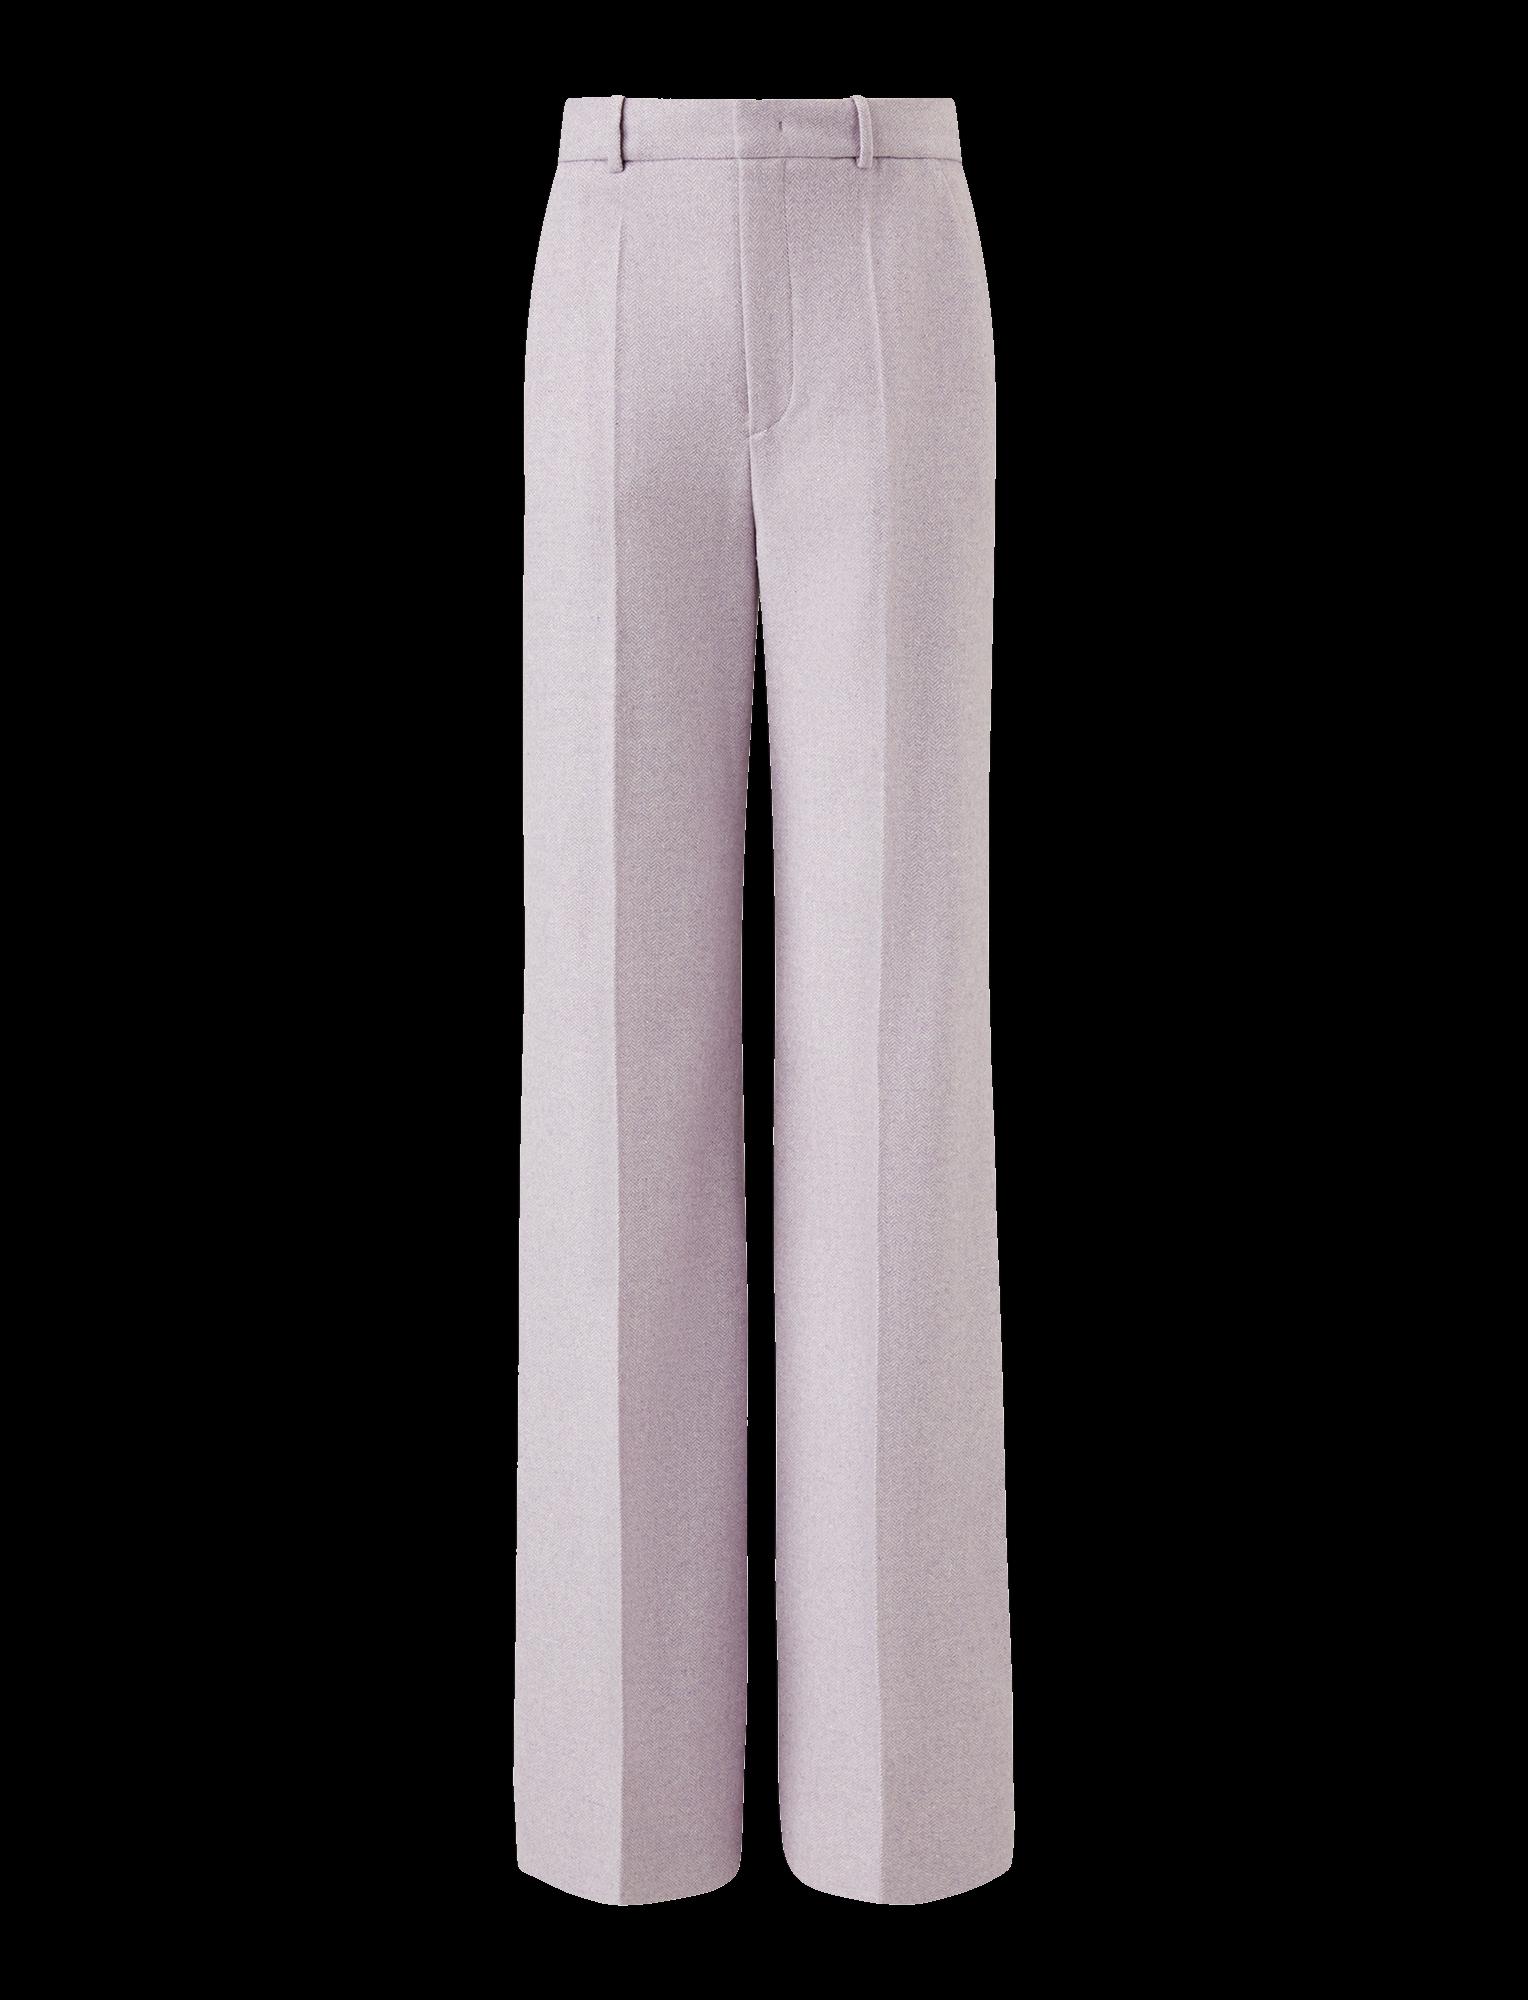 Joseph, Jess Herringbone Trousers, in LAVENDER